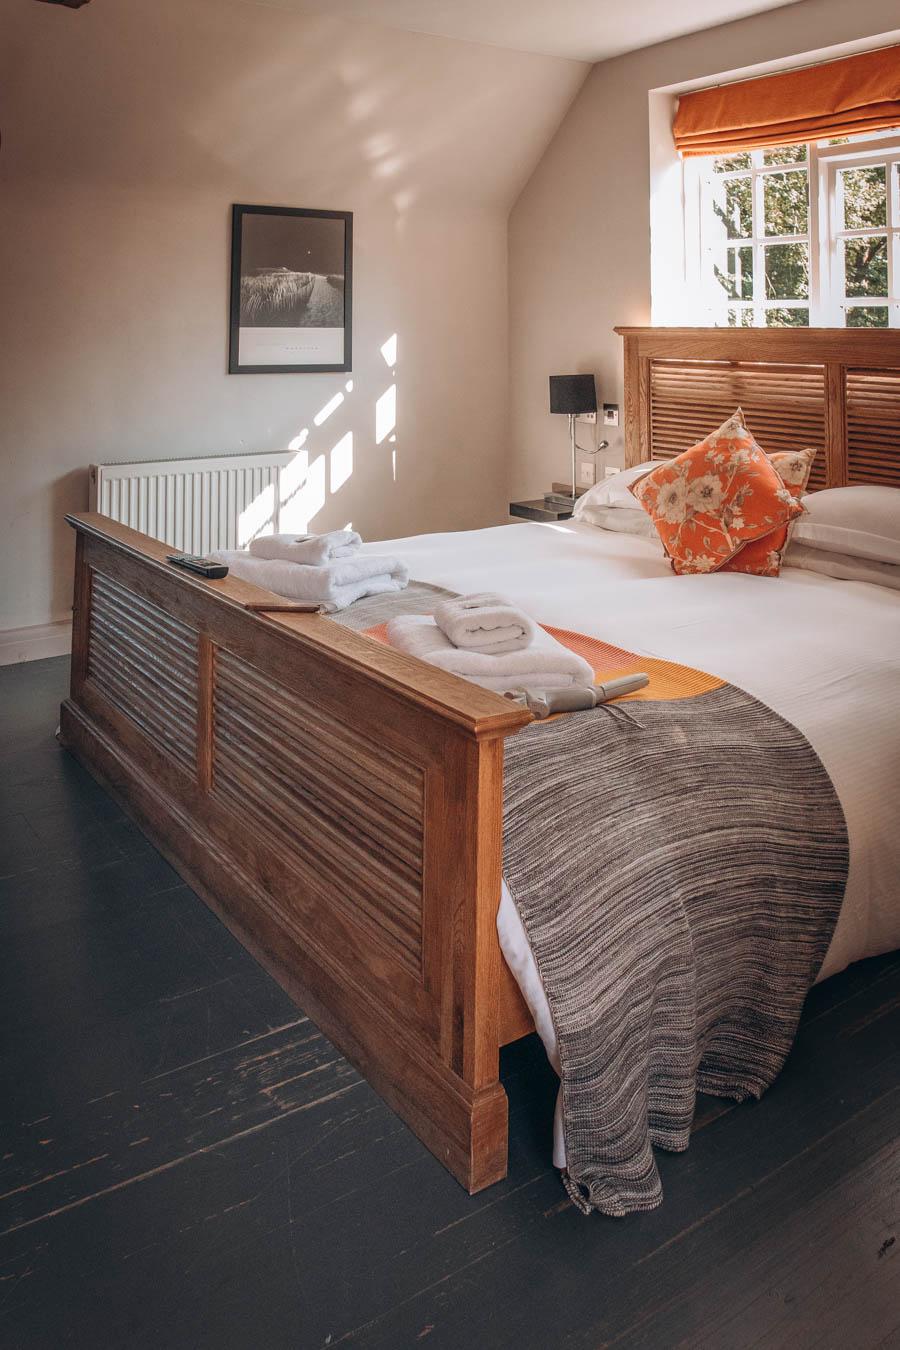 Boutique hotels   Bed at The Old House, Effingham Road, Copthorne, West Sussex